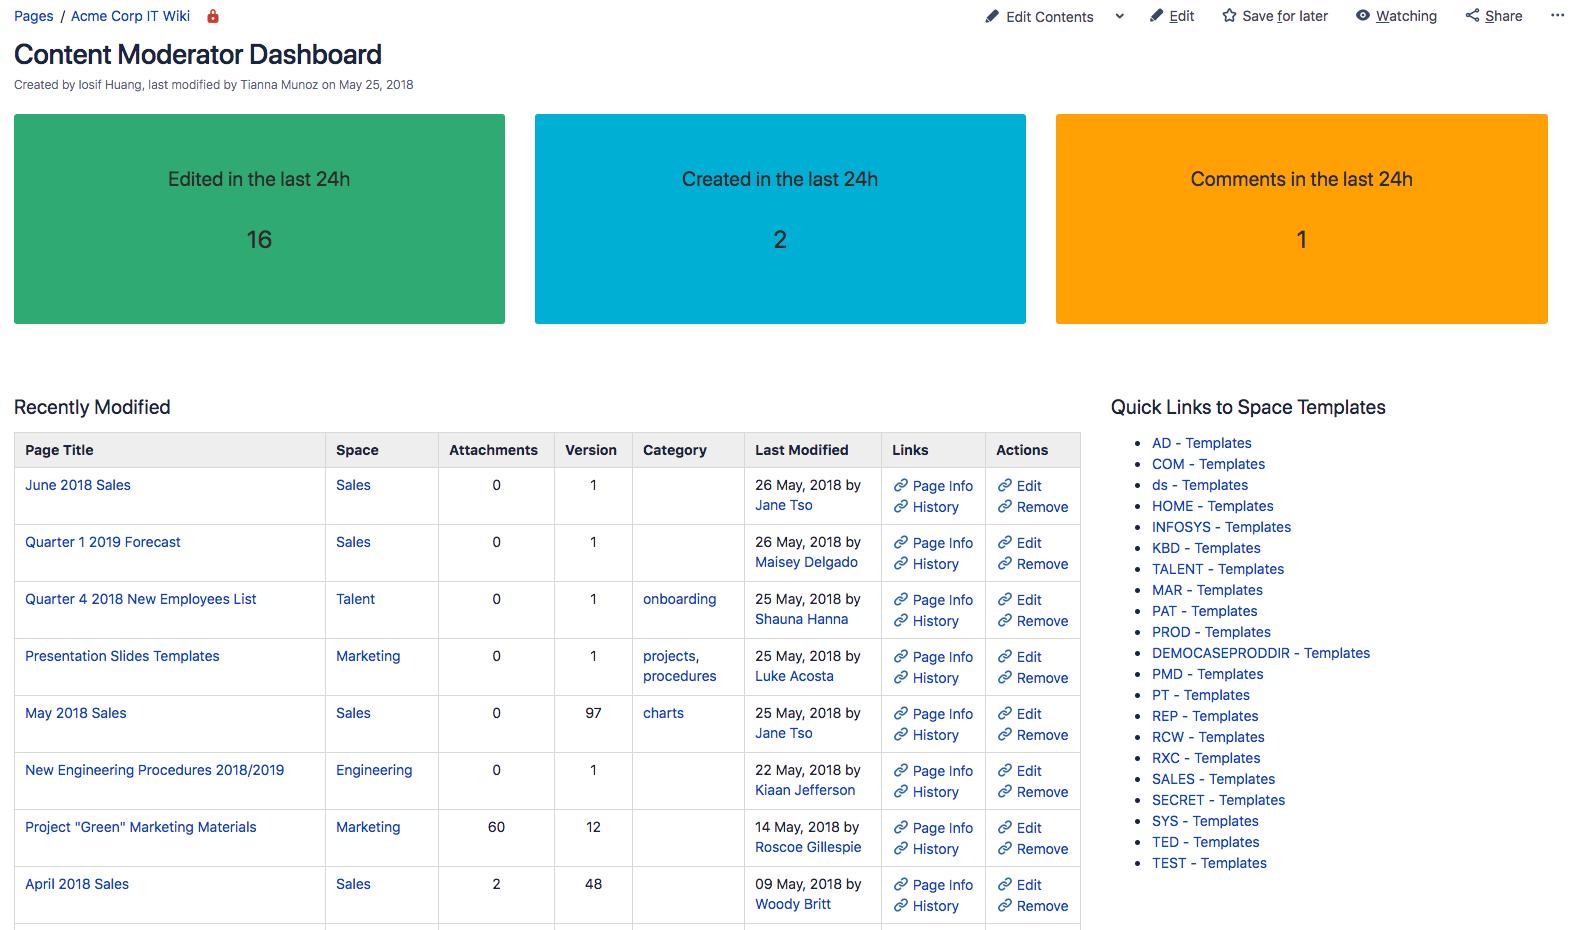 Content Moderator Dashboard